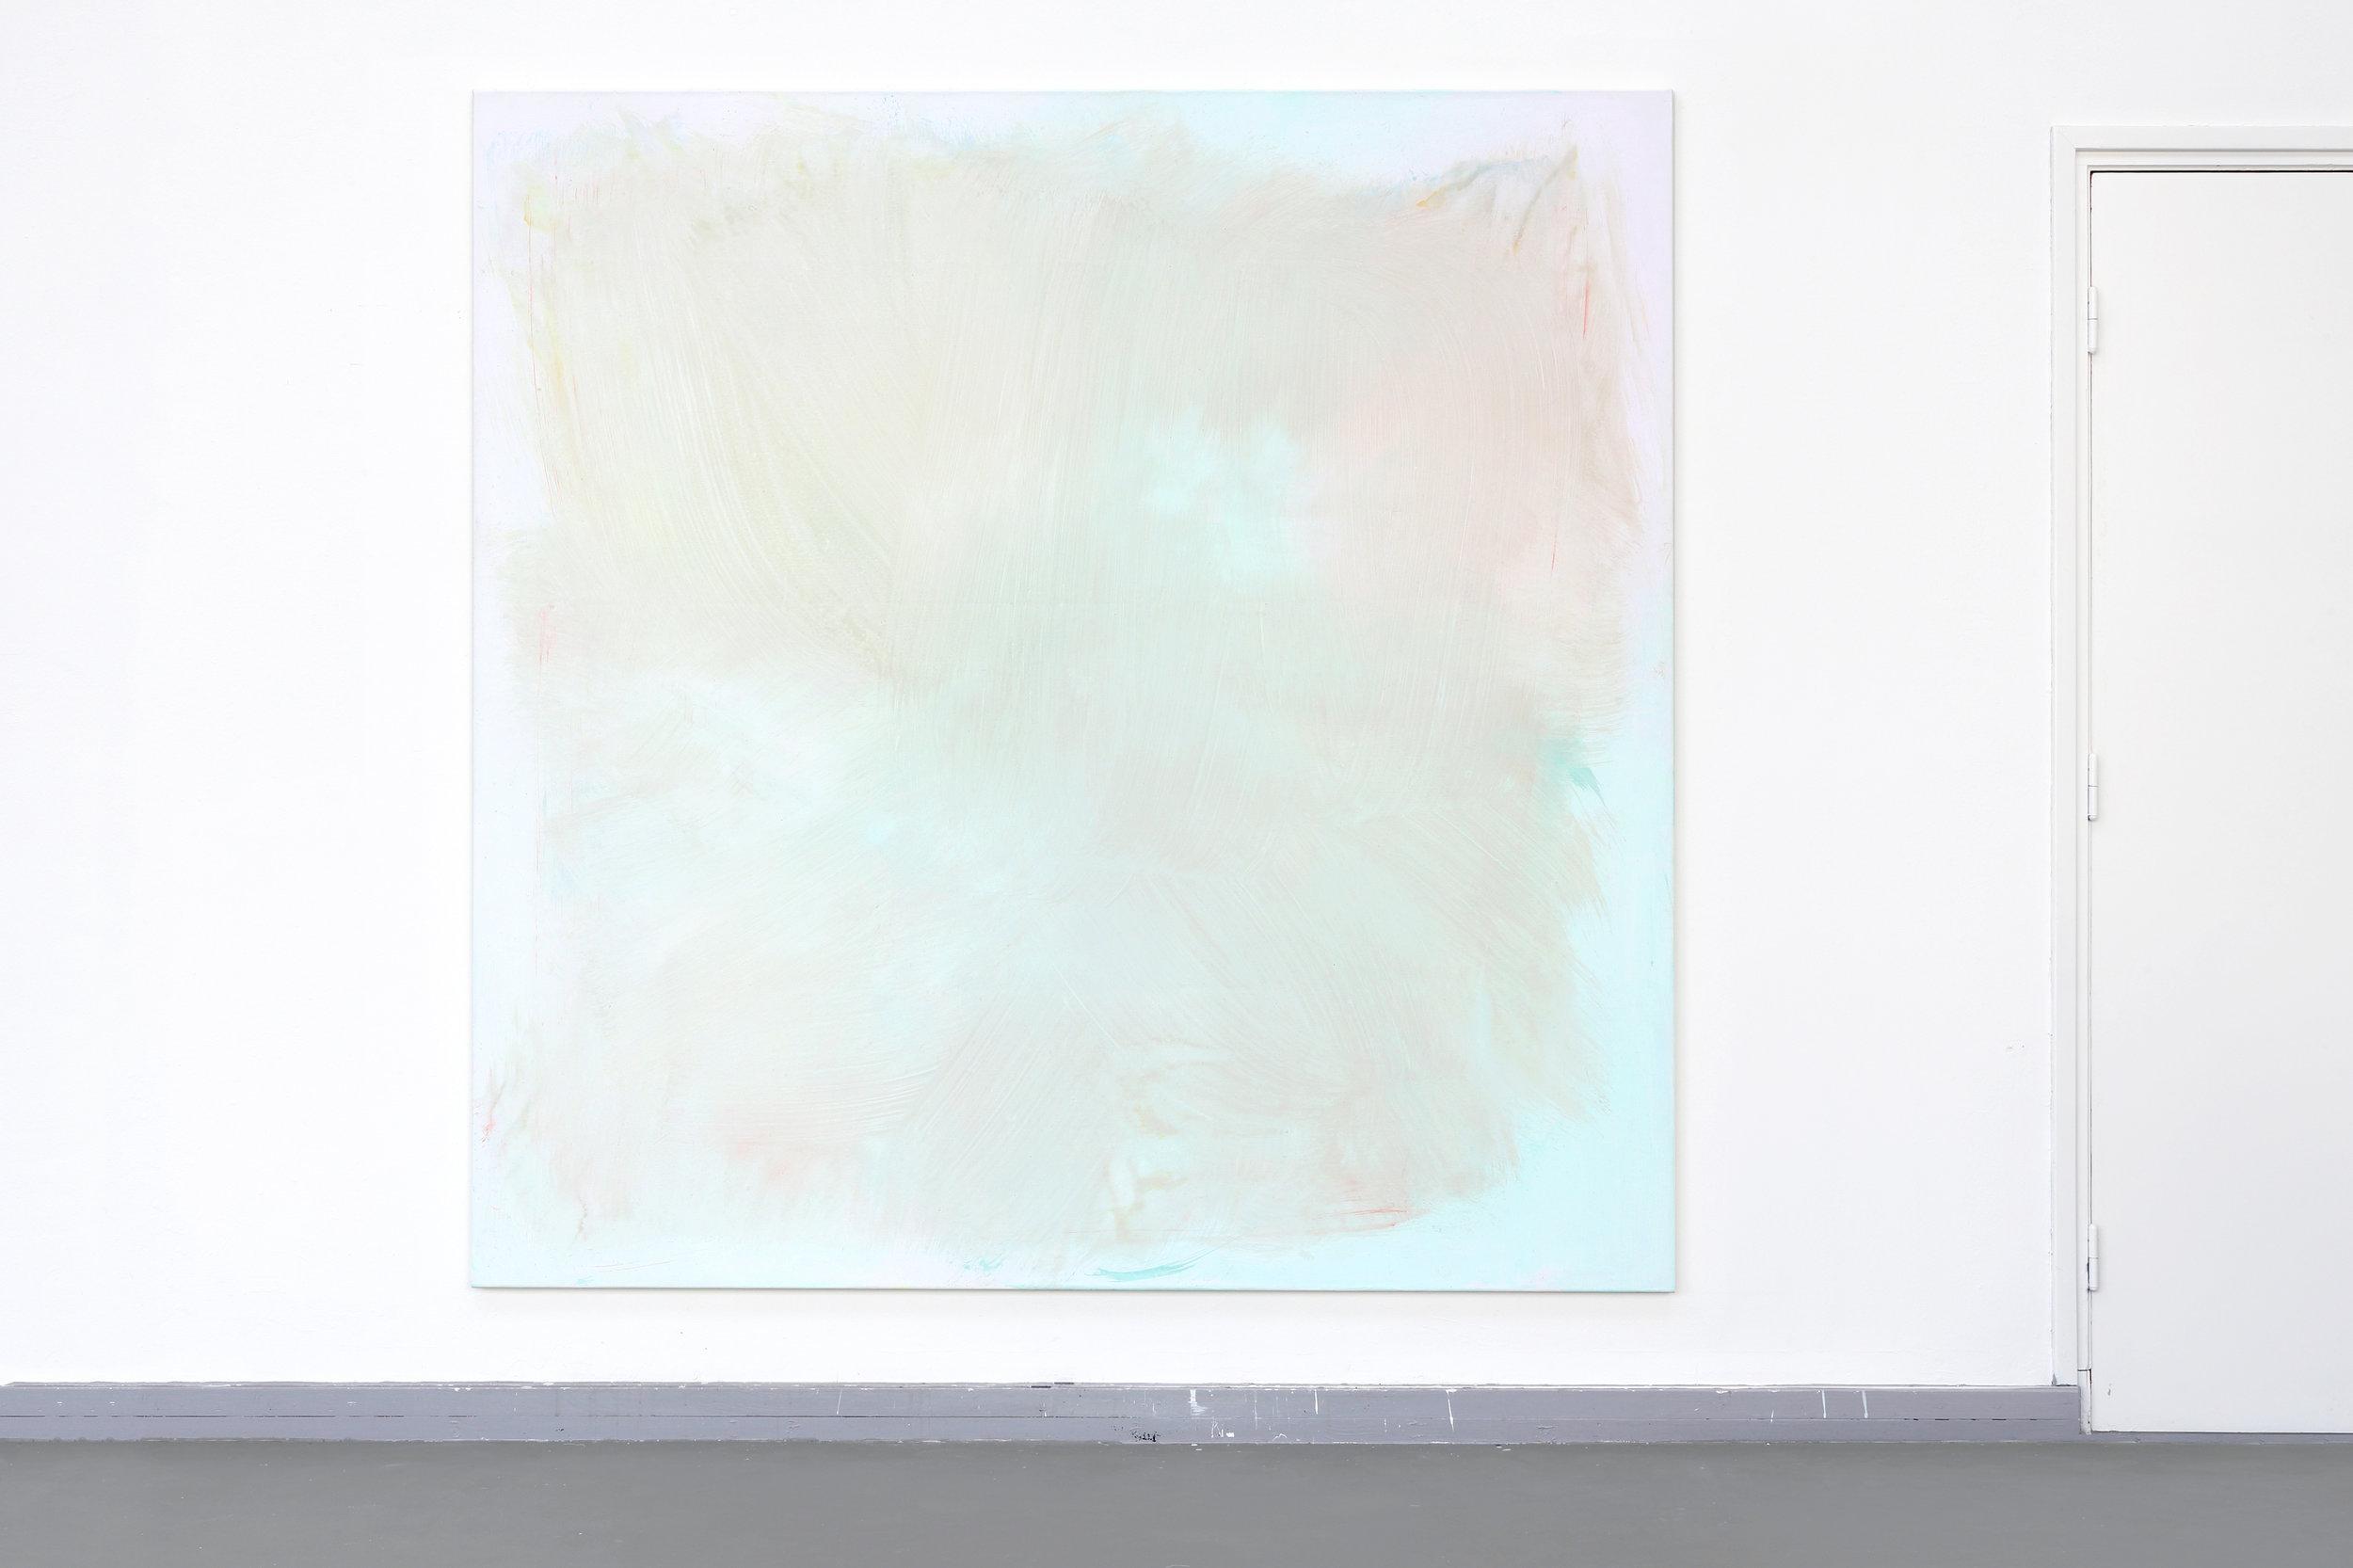 Poetsdoek 6 (Broom)  - Egg-tempera on canvas, 200 x 200 cm, 2018